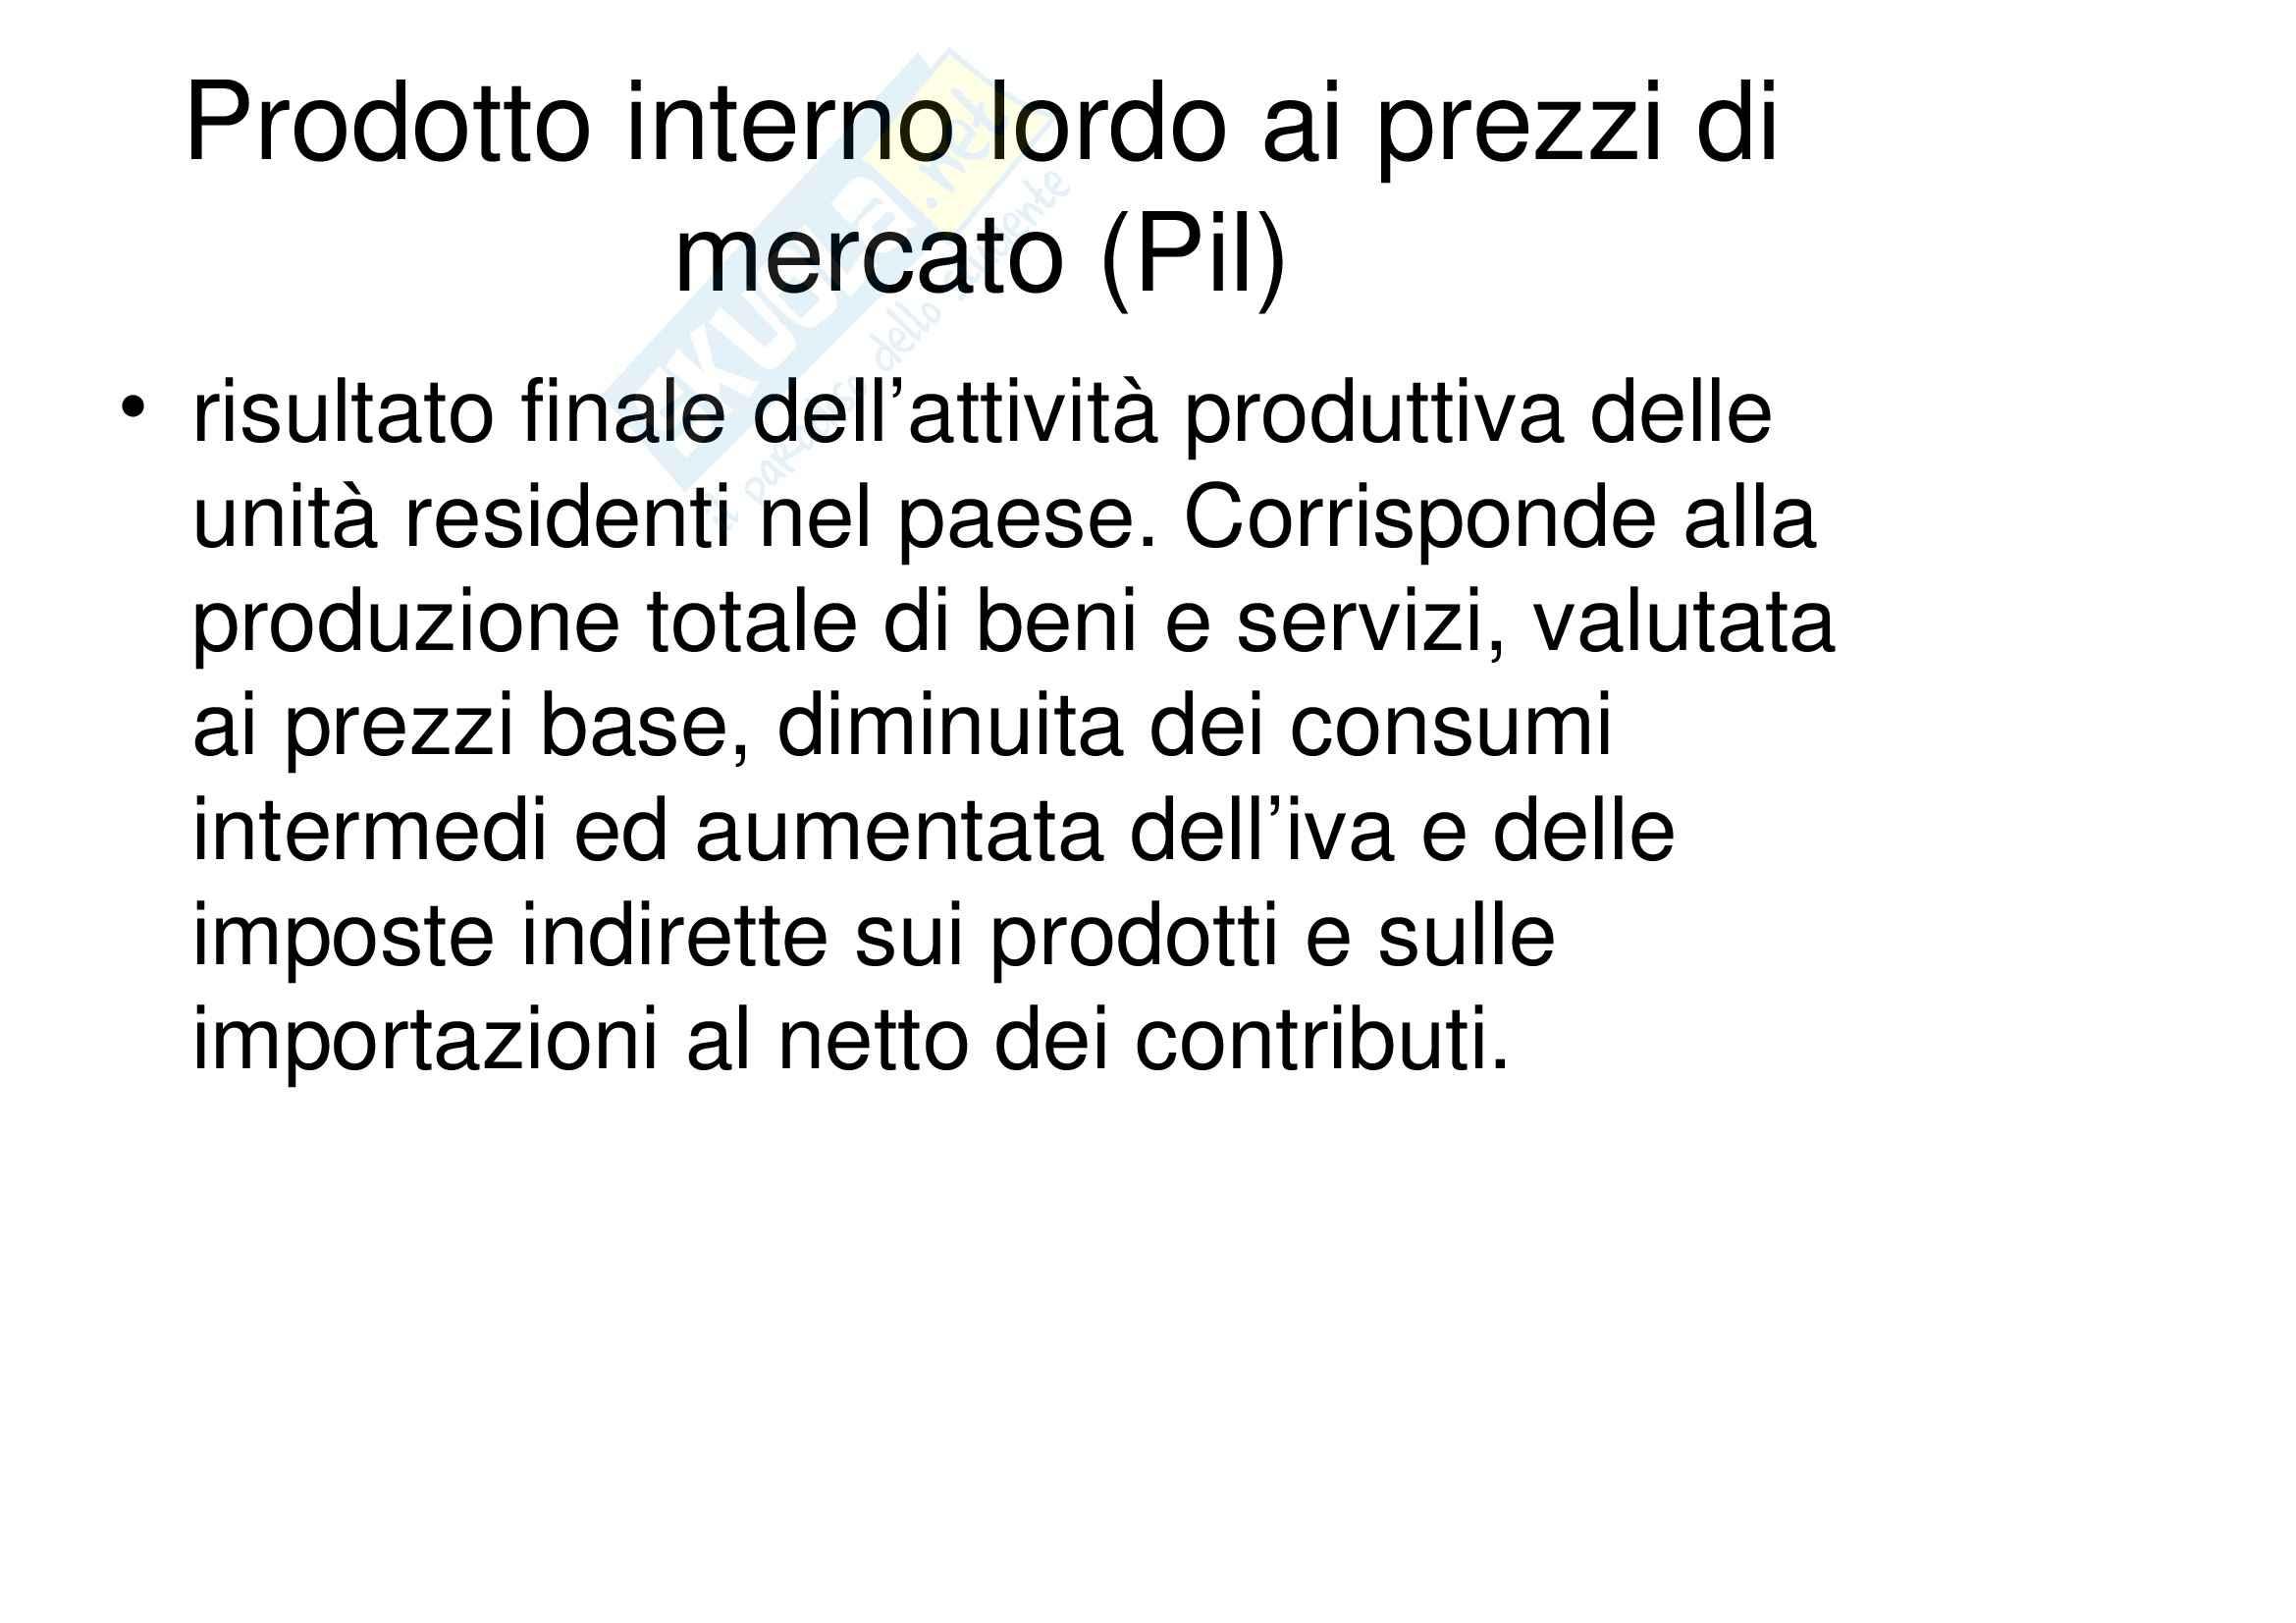 Economia italiana ed europea - Appunti